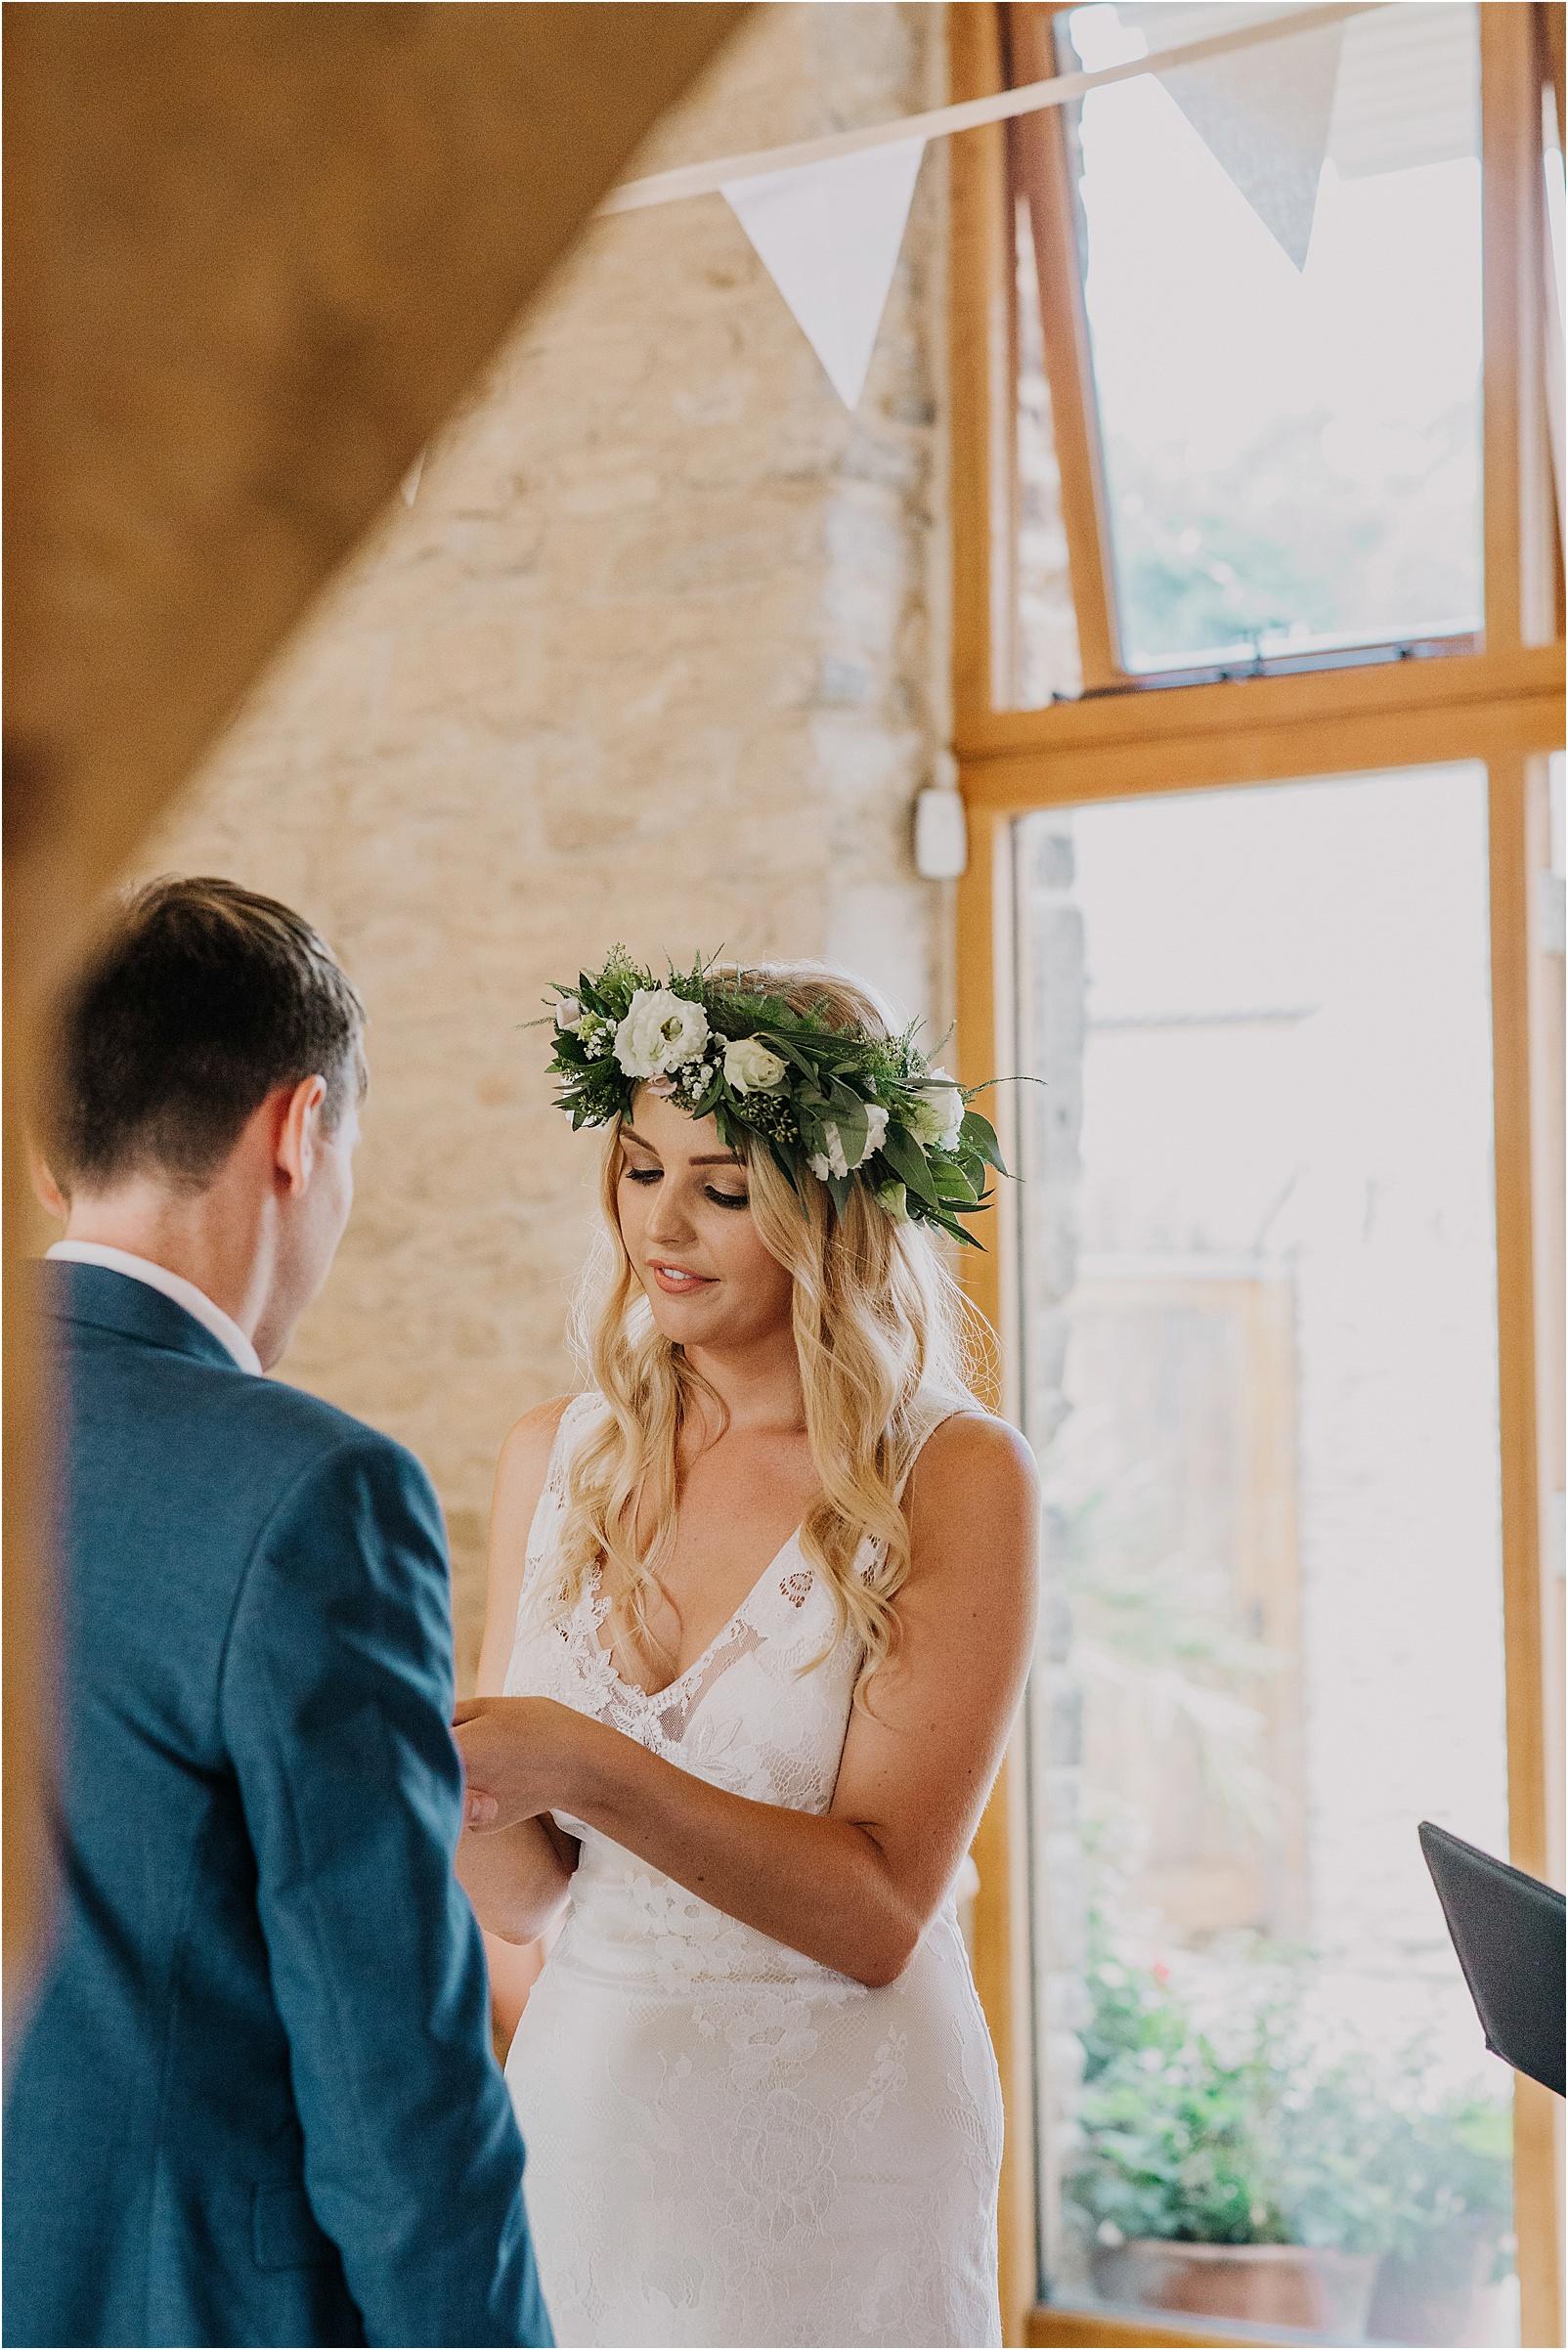 flower crown bride exchanging rings at Kingscote Barn wedding